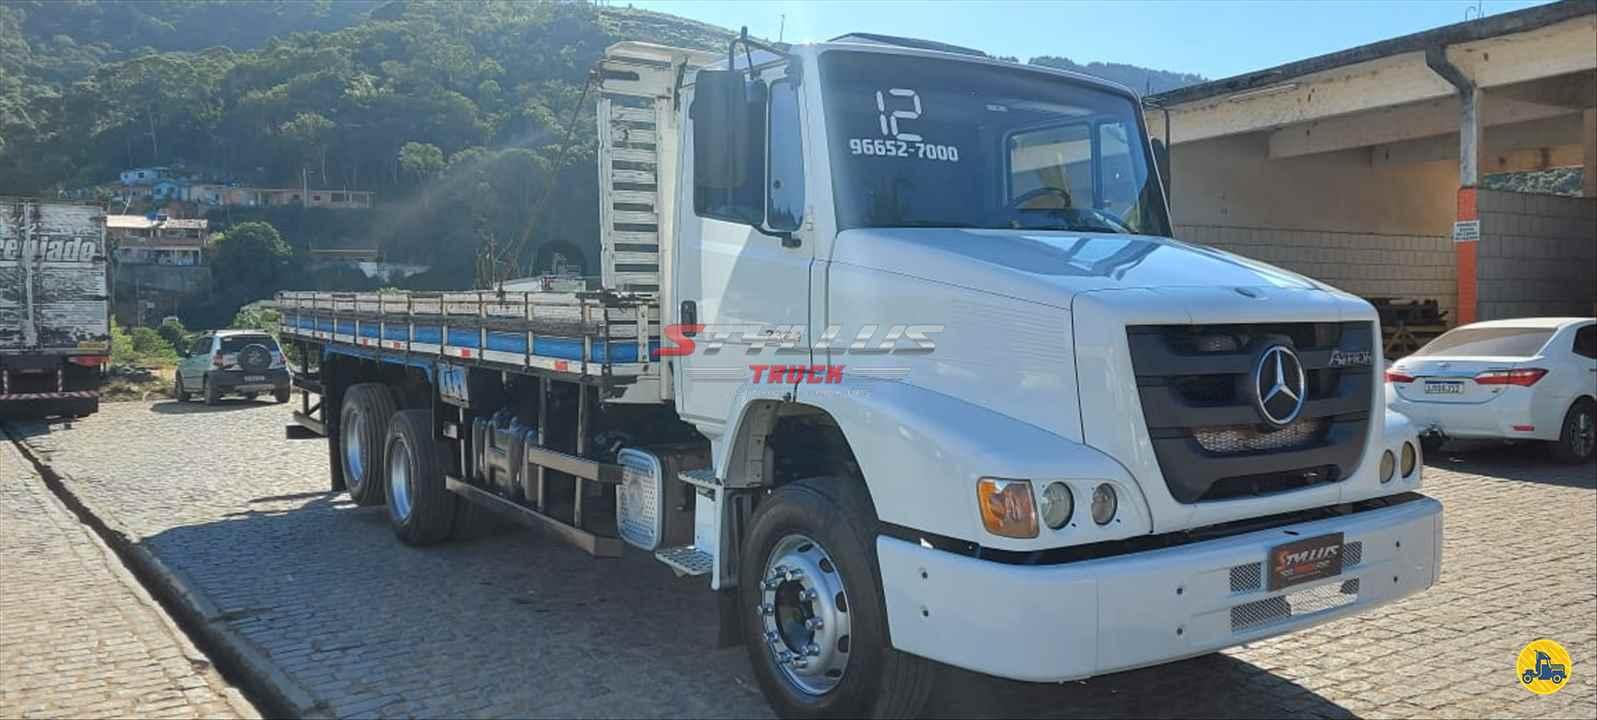 CAMINHAO MERCEDES-BENZ MB 2324 Carga Seca Truck 6x2 Styllus Truck TERESOPOLIS RIO DE JANEIRO RJ